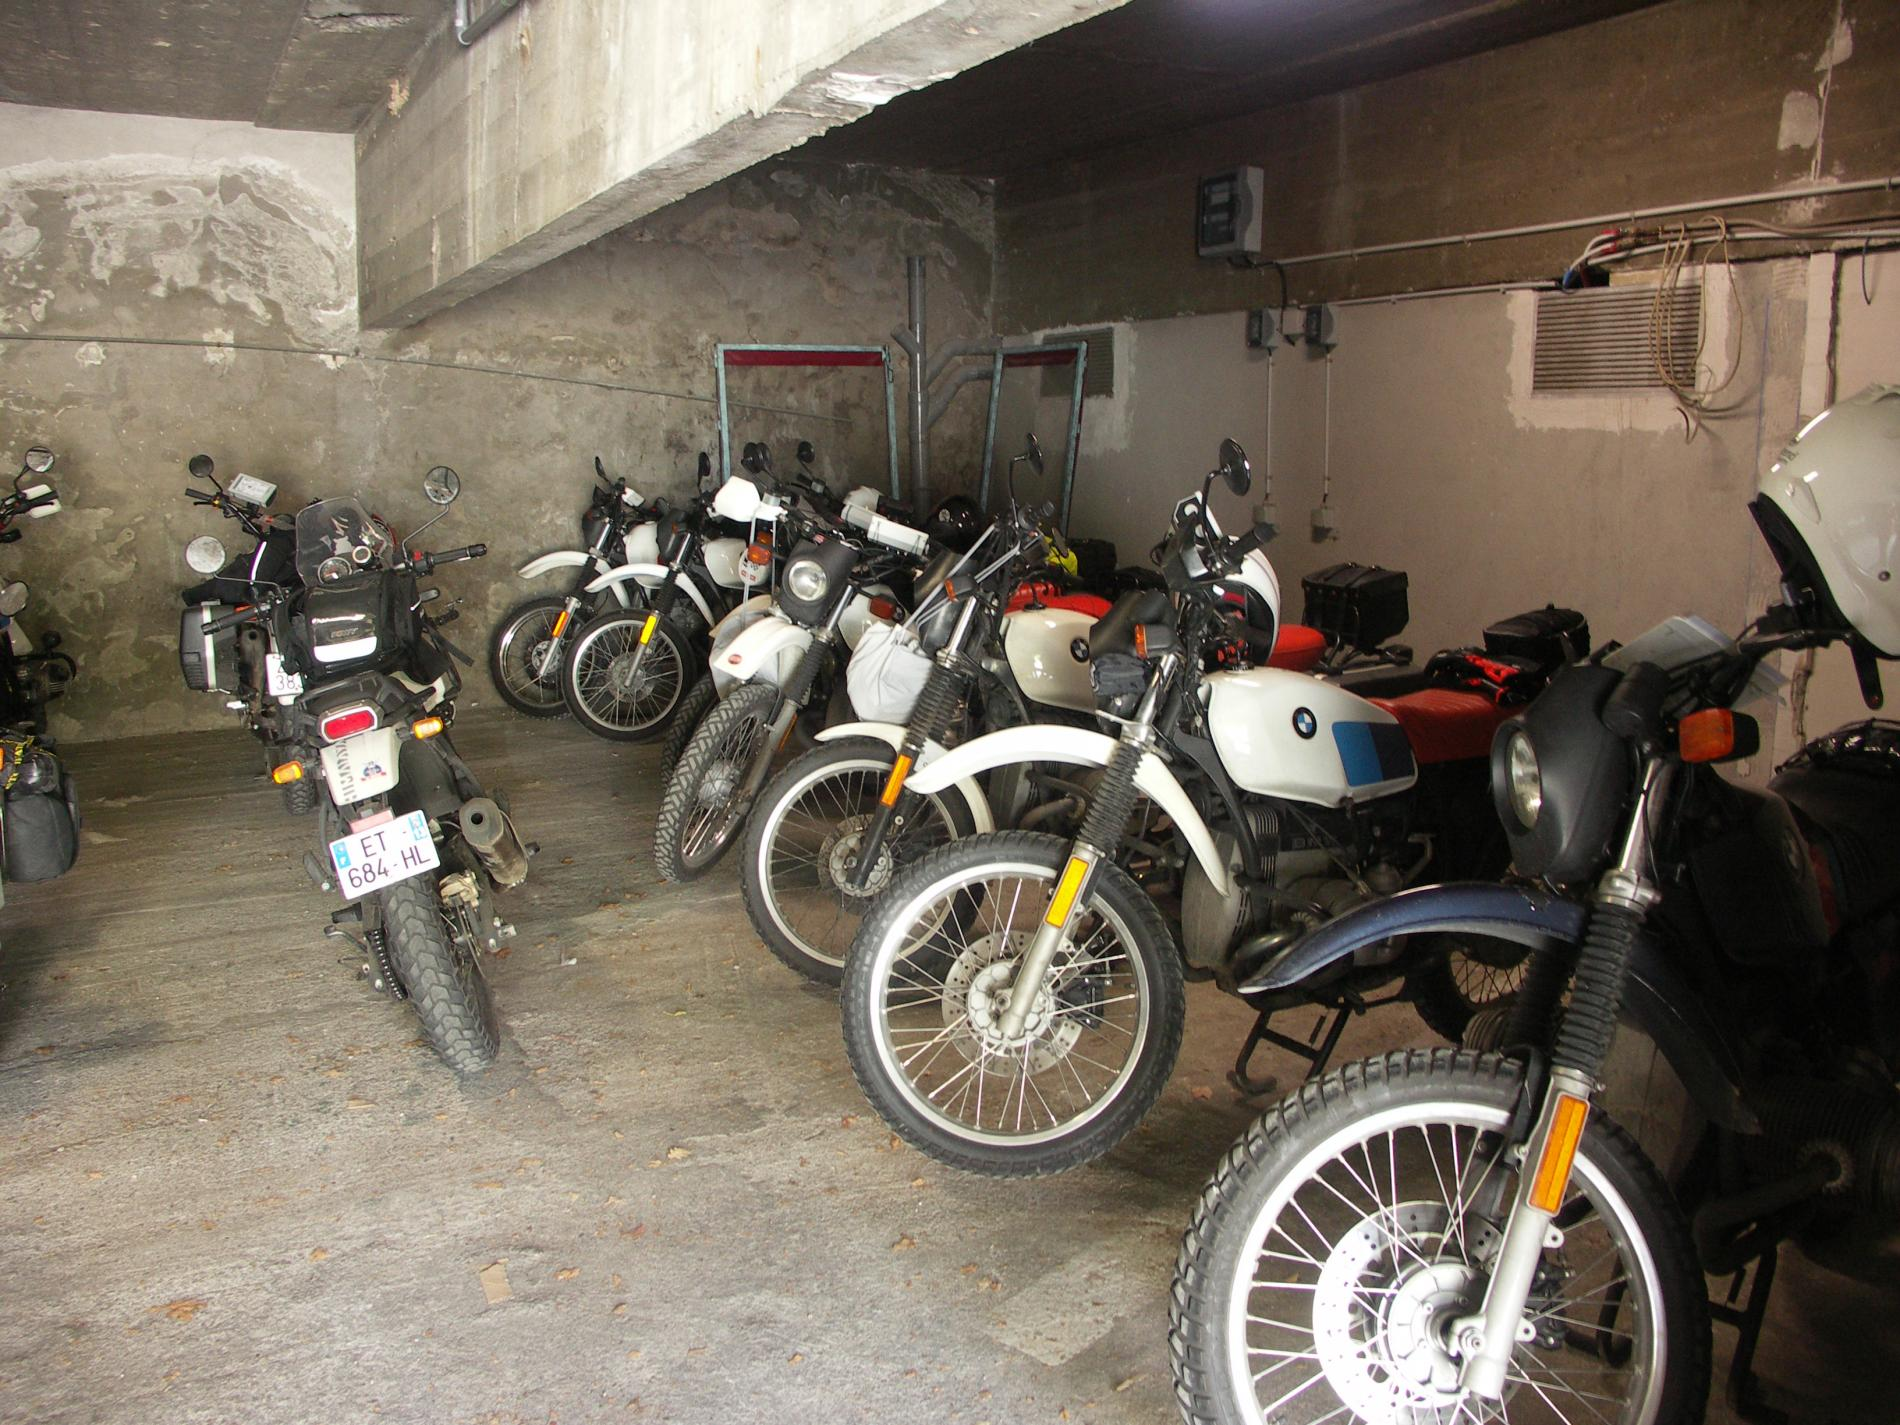 Accueils groupes motos et voitures